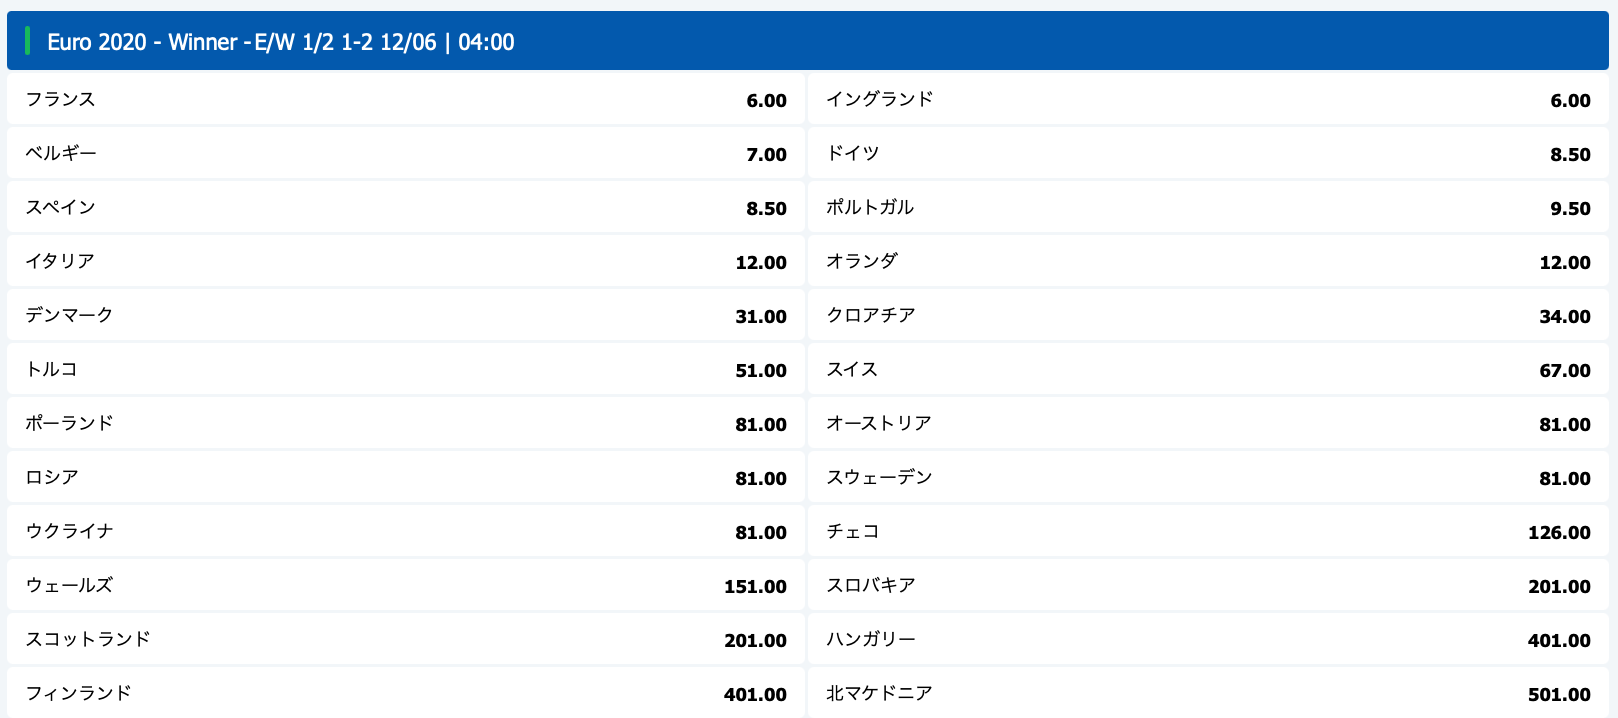 EURO2020 優勝予想オッズブックメーカー